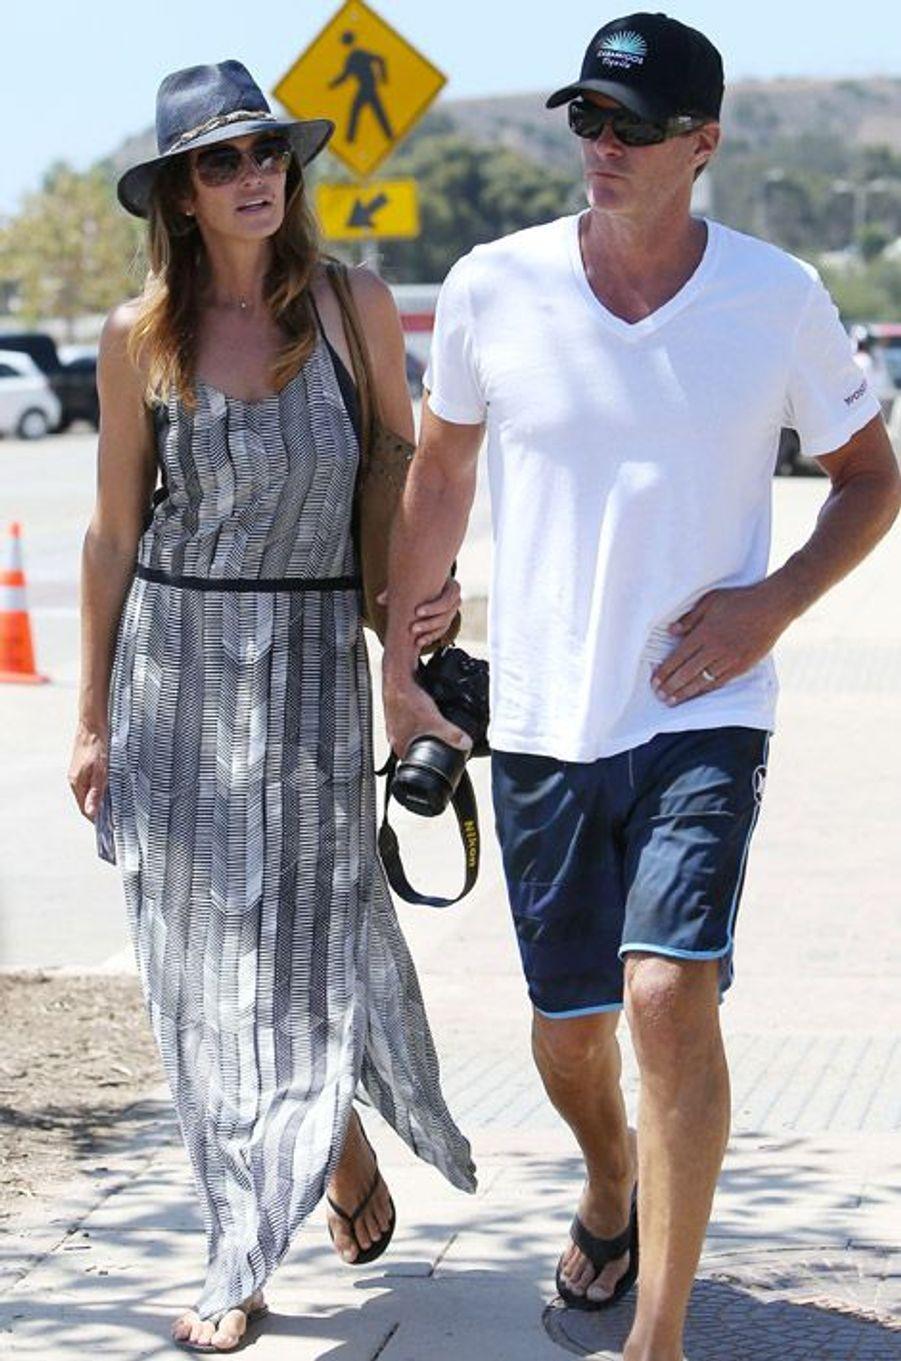 Cindy Crawford avec son mari Randy Gerber pour une promenade à Malibu le 30 août 2014